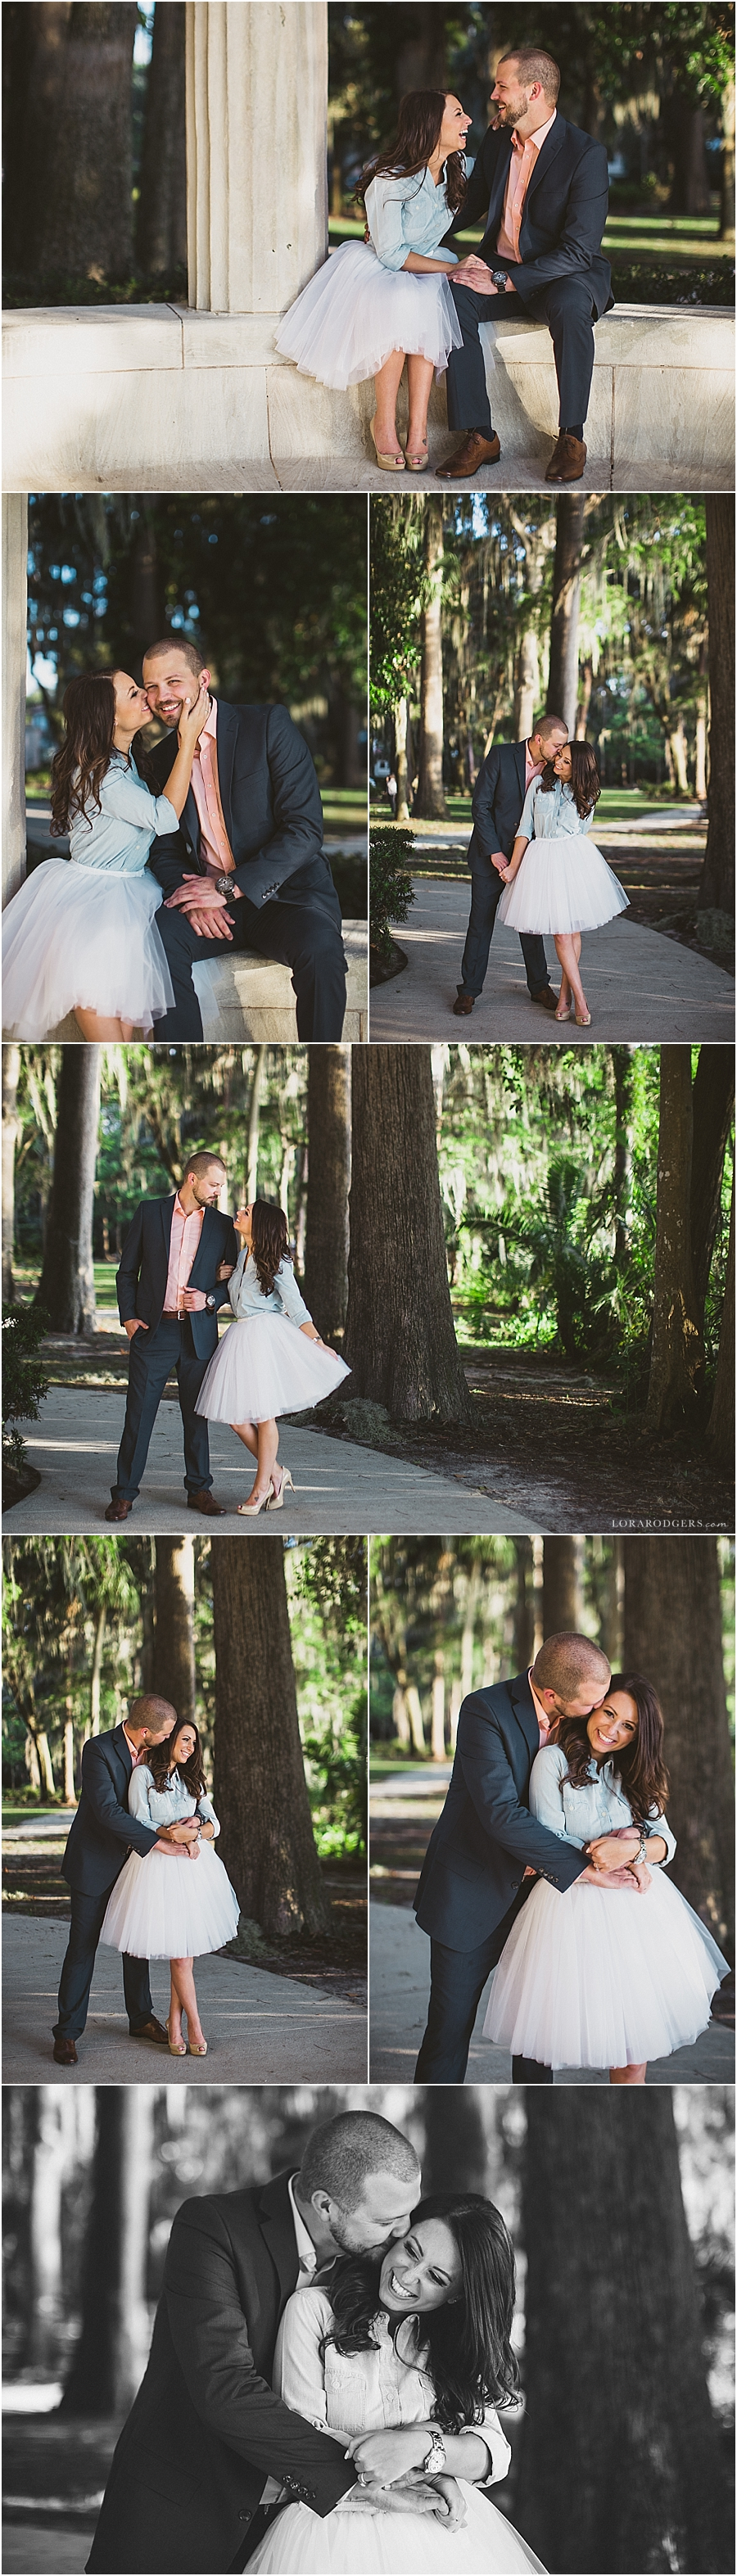 Kraft_Azalea_Engagement_Winter_Park_Florida_006